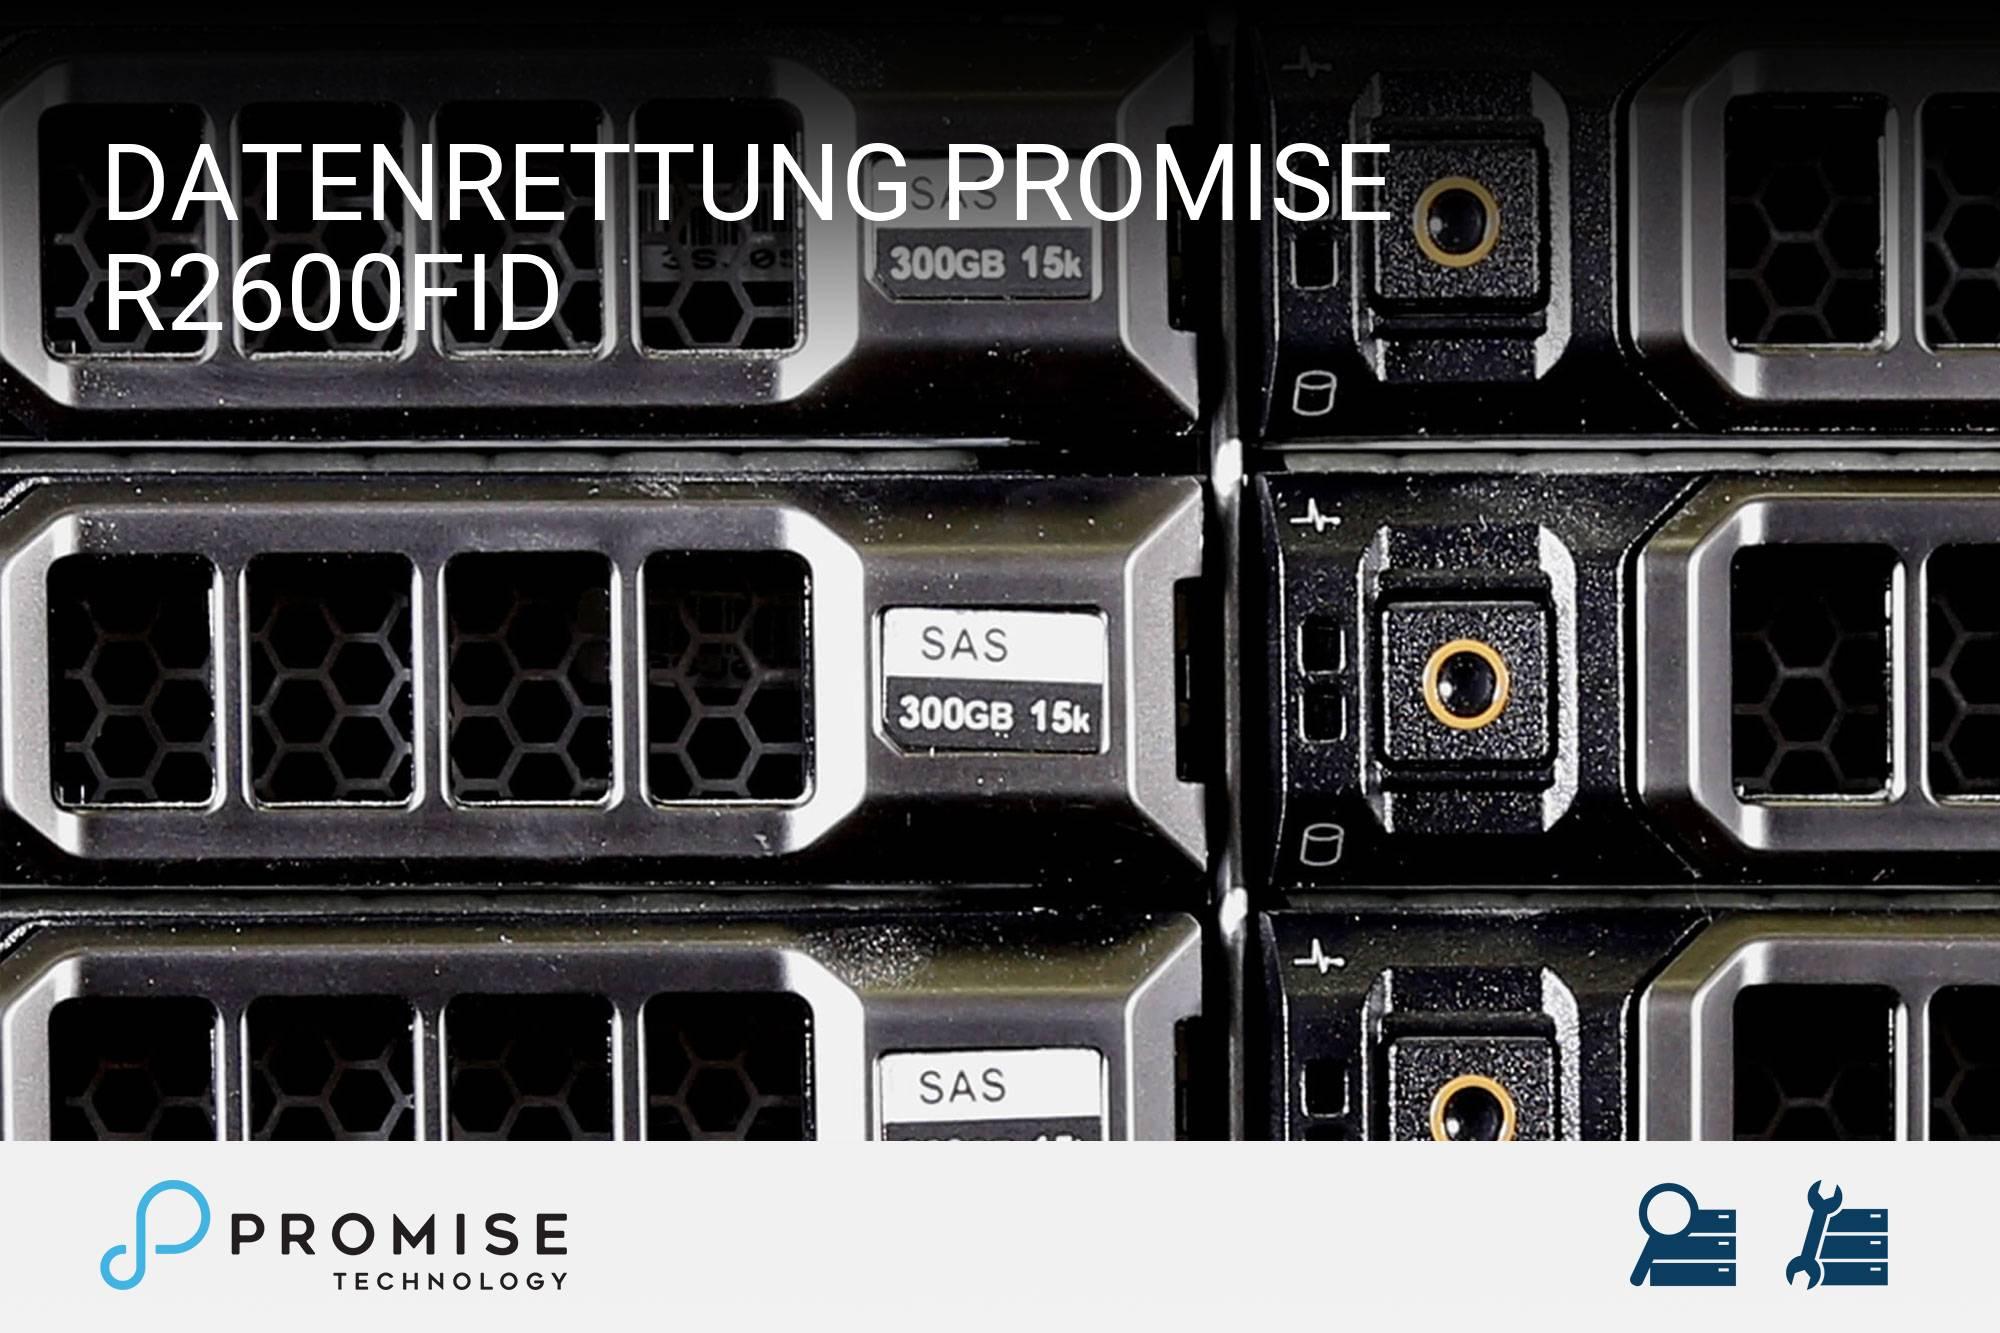 Promise R2600fiD